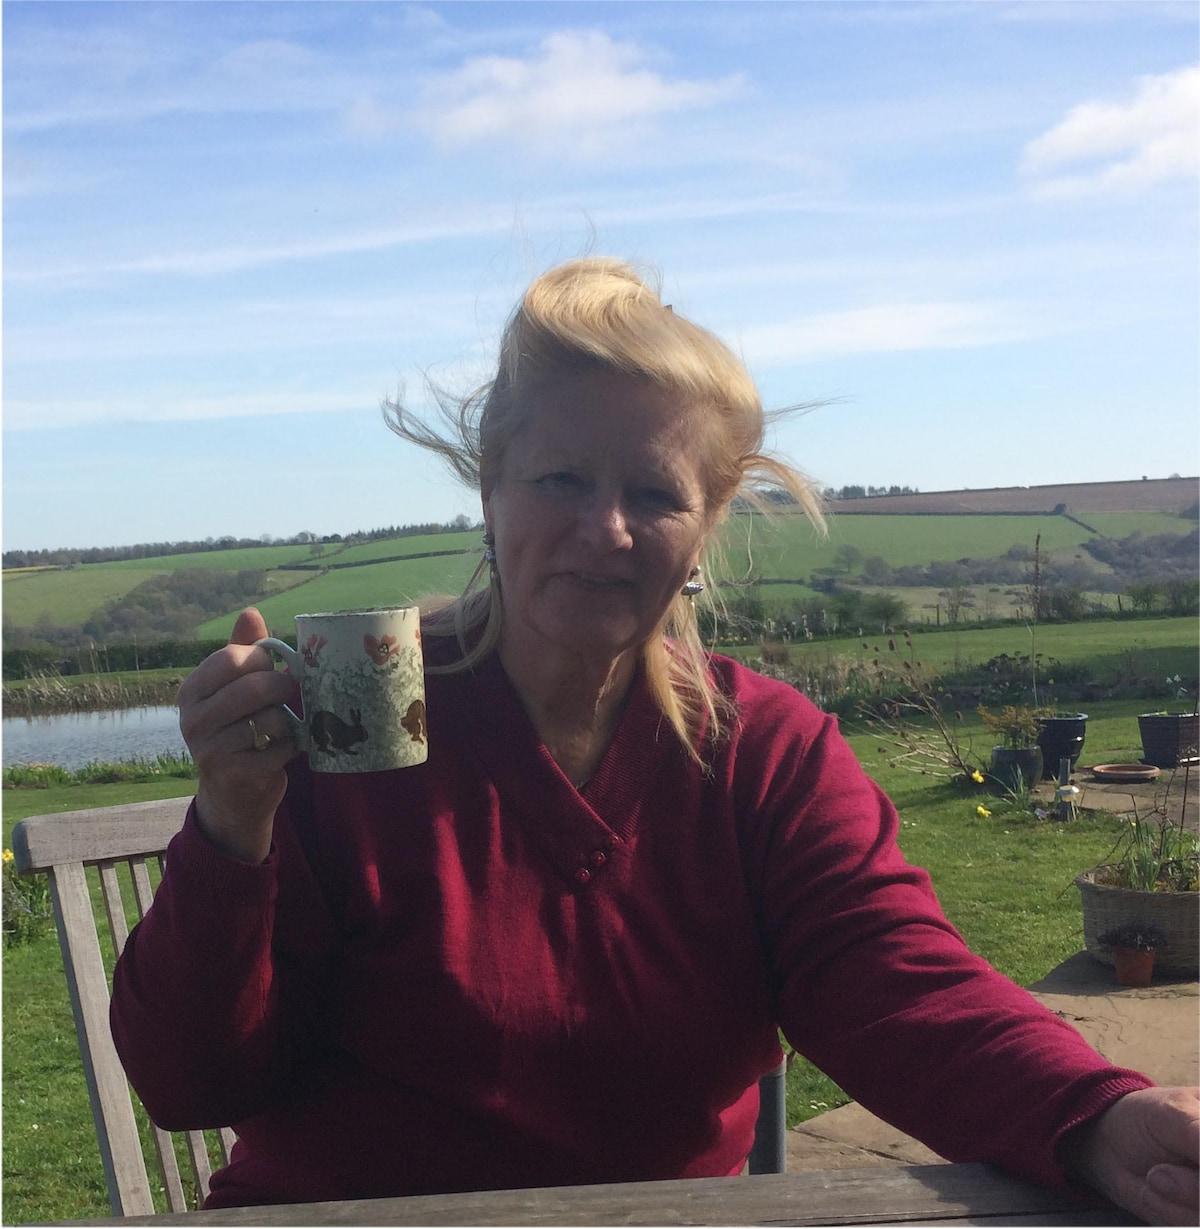 Claire from Winterborne Stickland